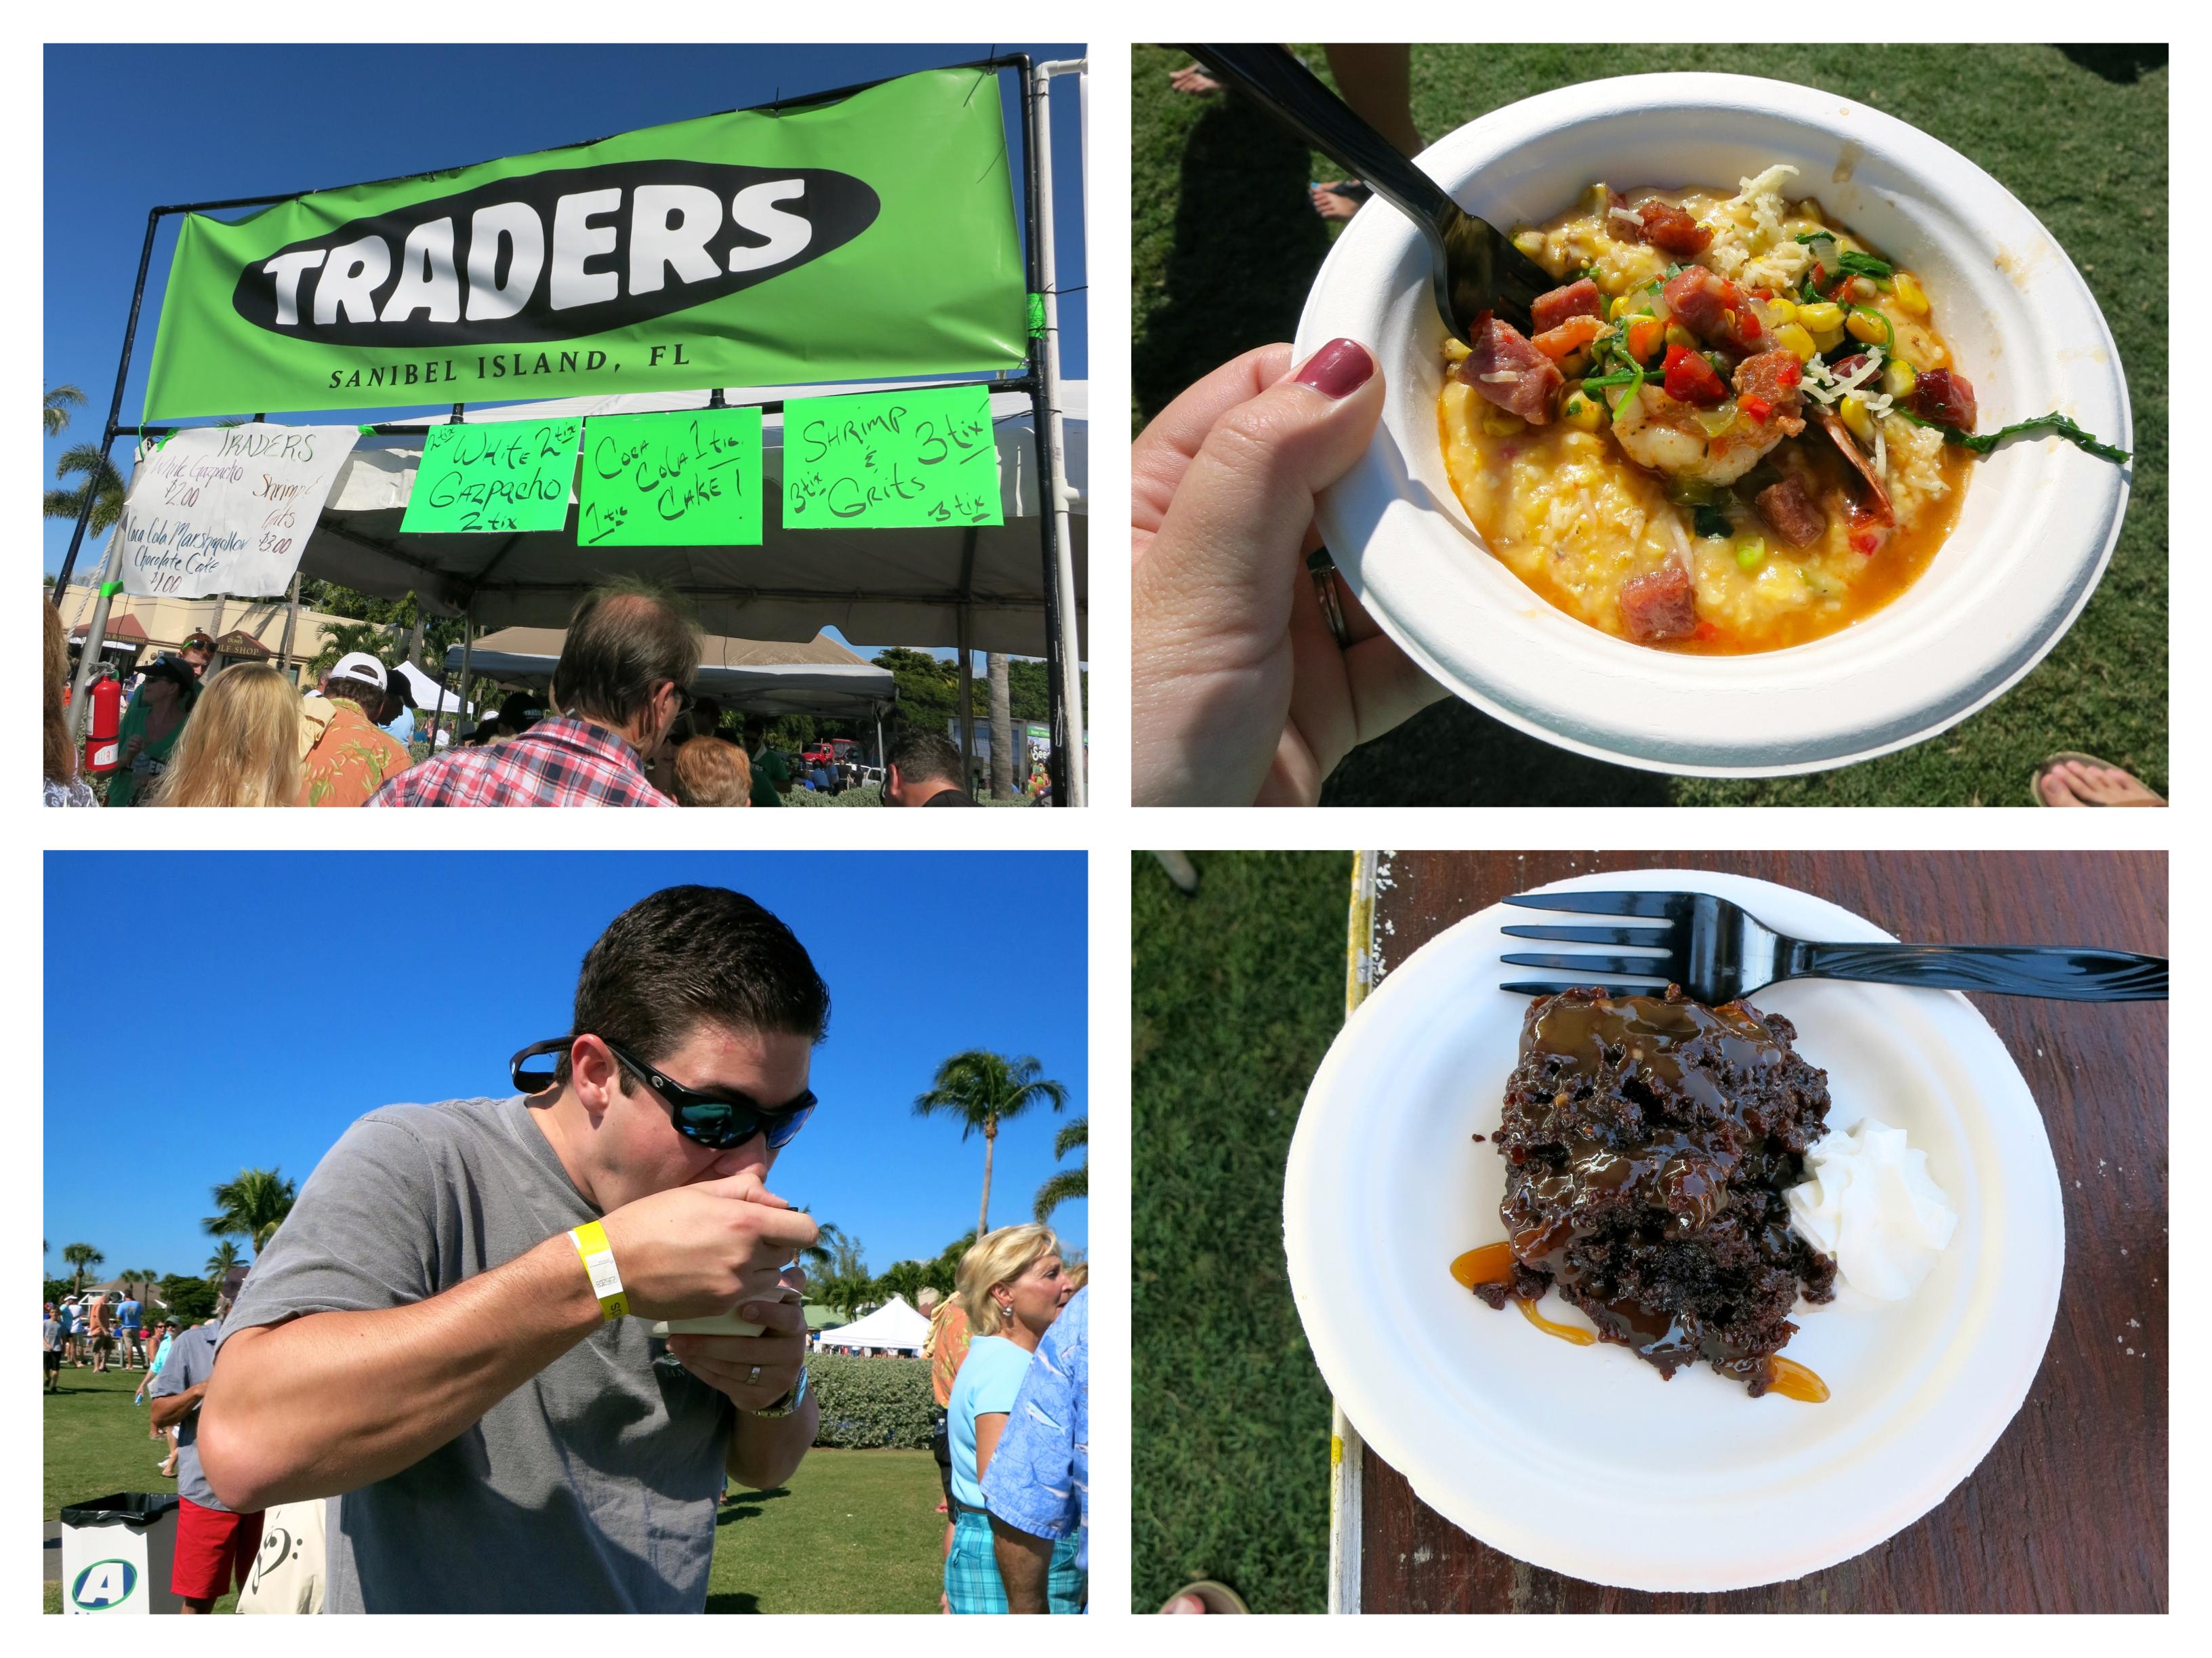 Taste of the Islands-Traders